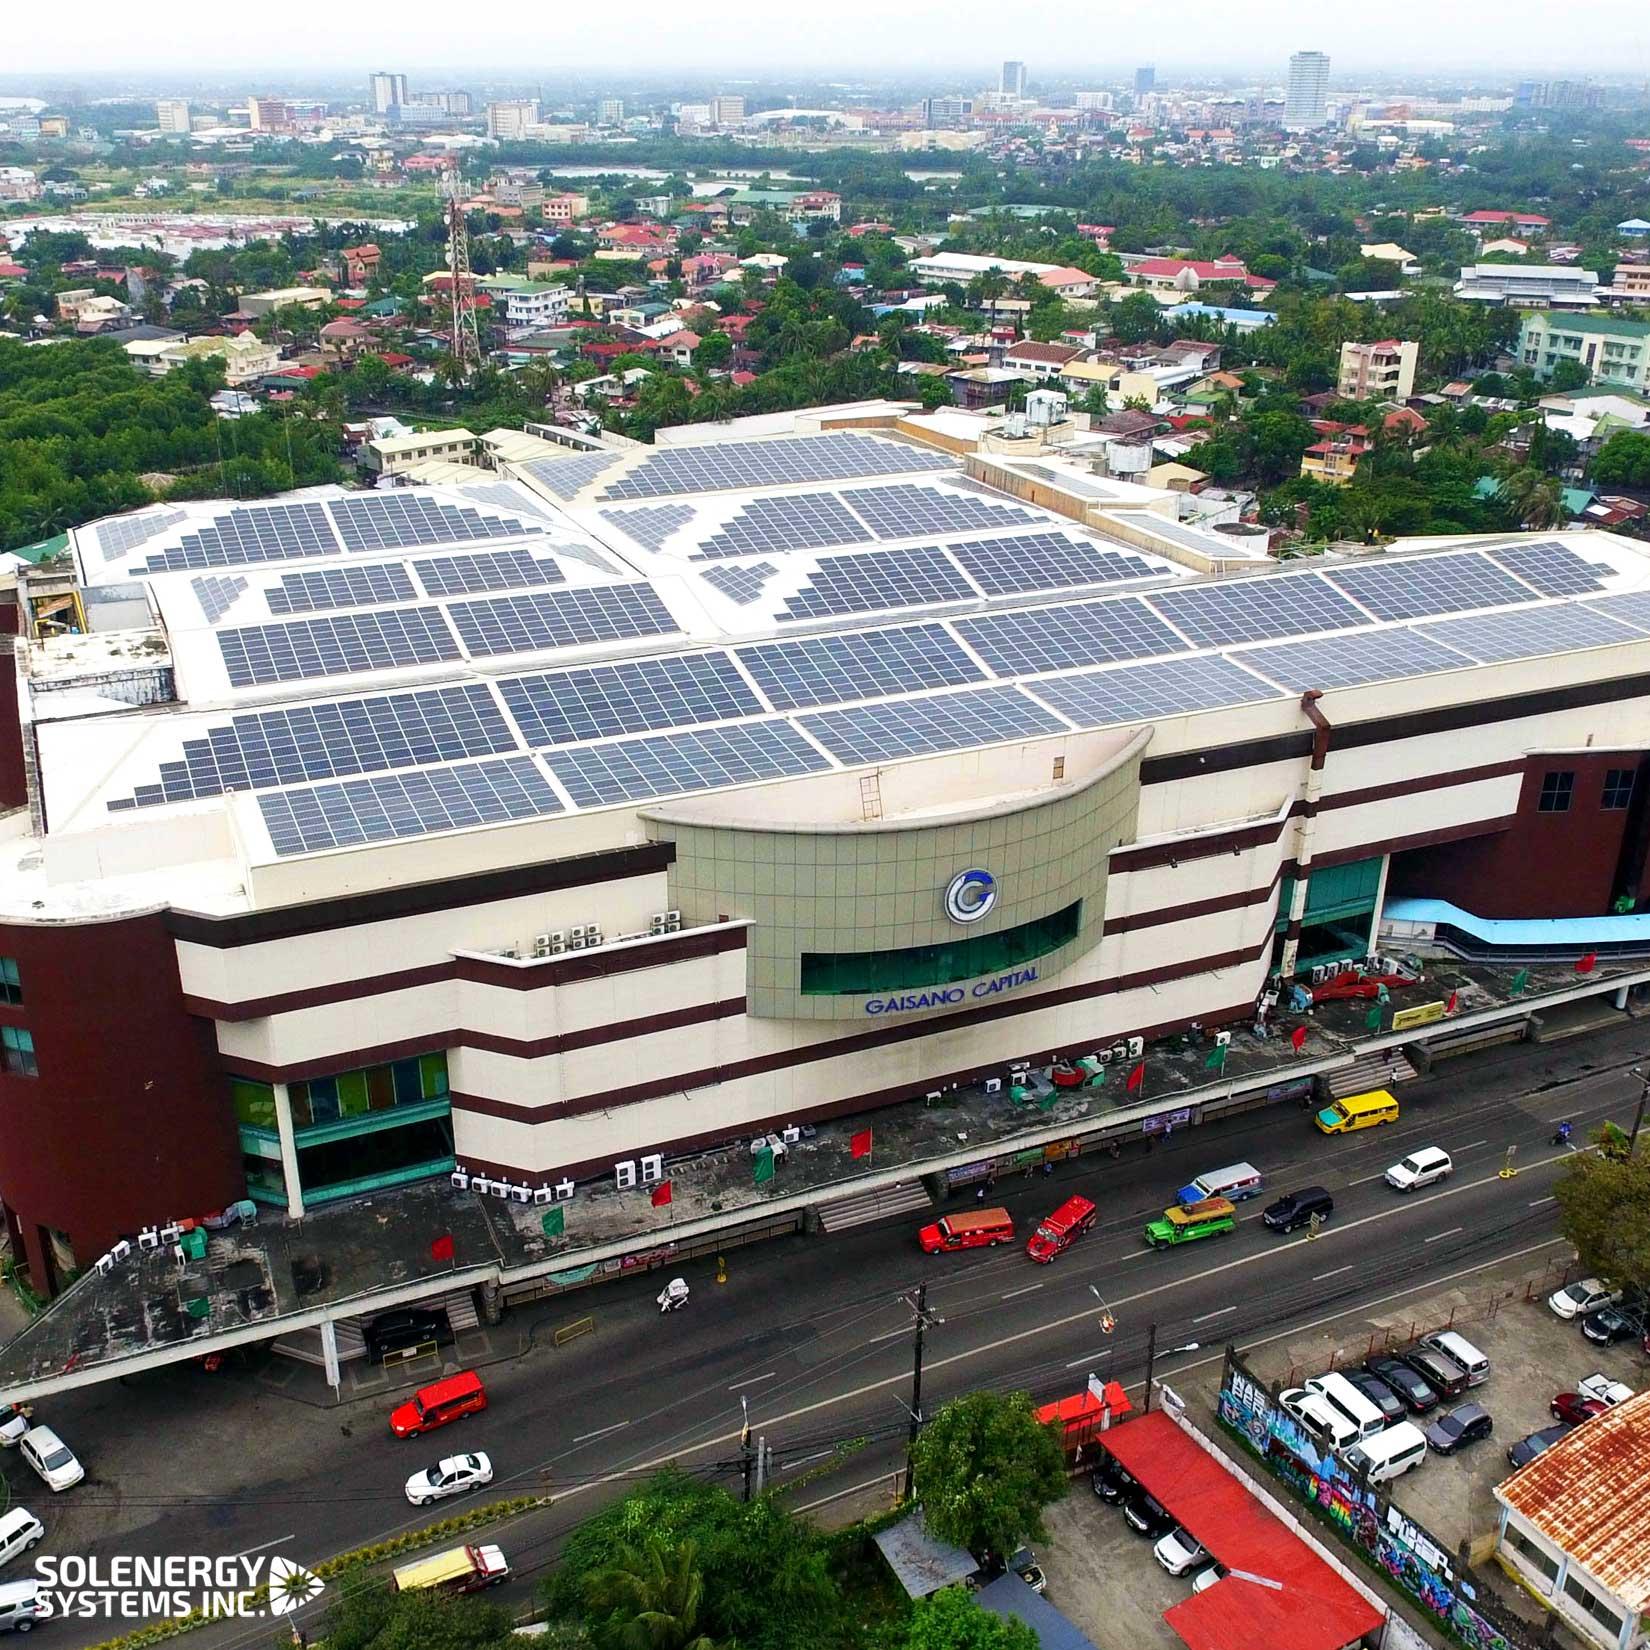 Gaisano-Capital-Mall-Solenergy